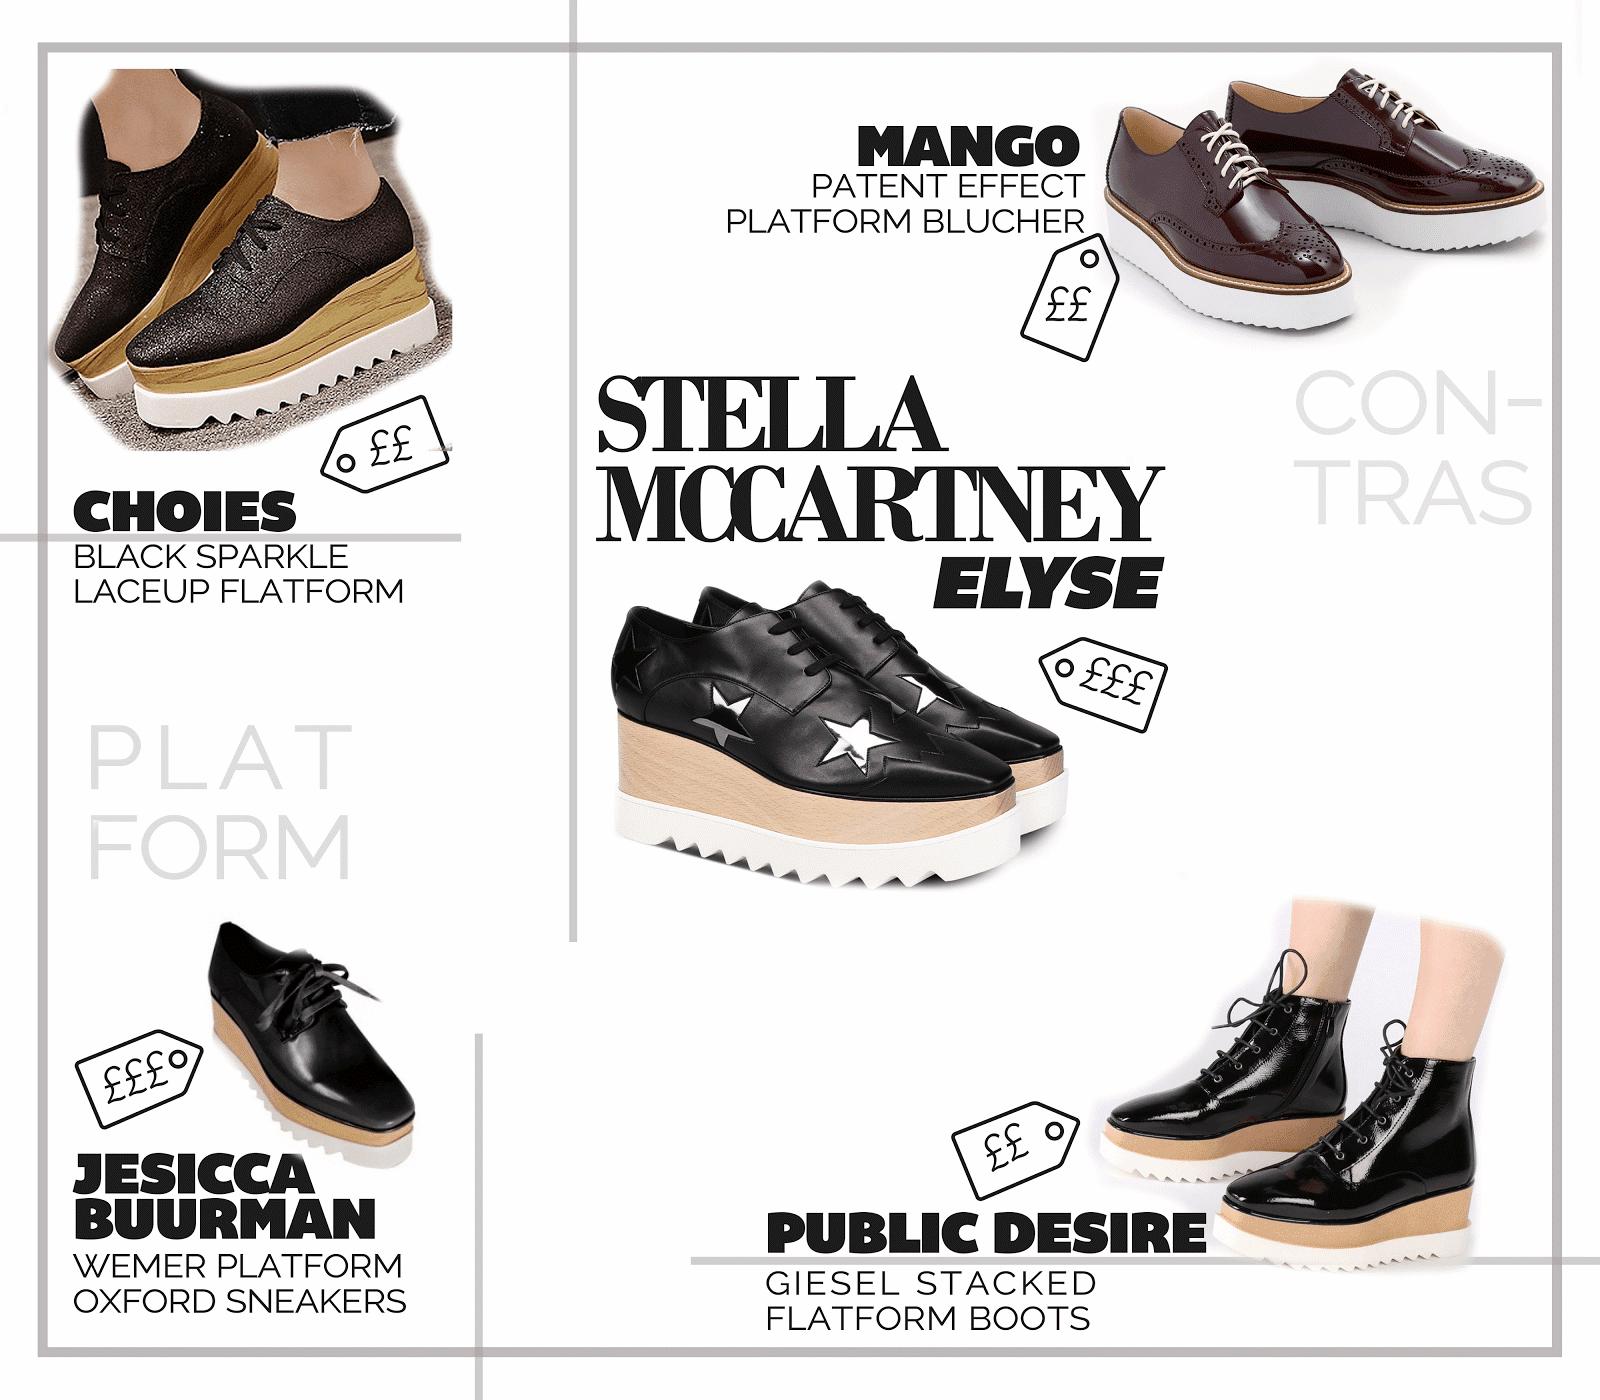 designer shoe stella mccartney elyse britt platform wedges best high street dupes